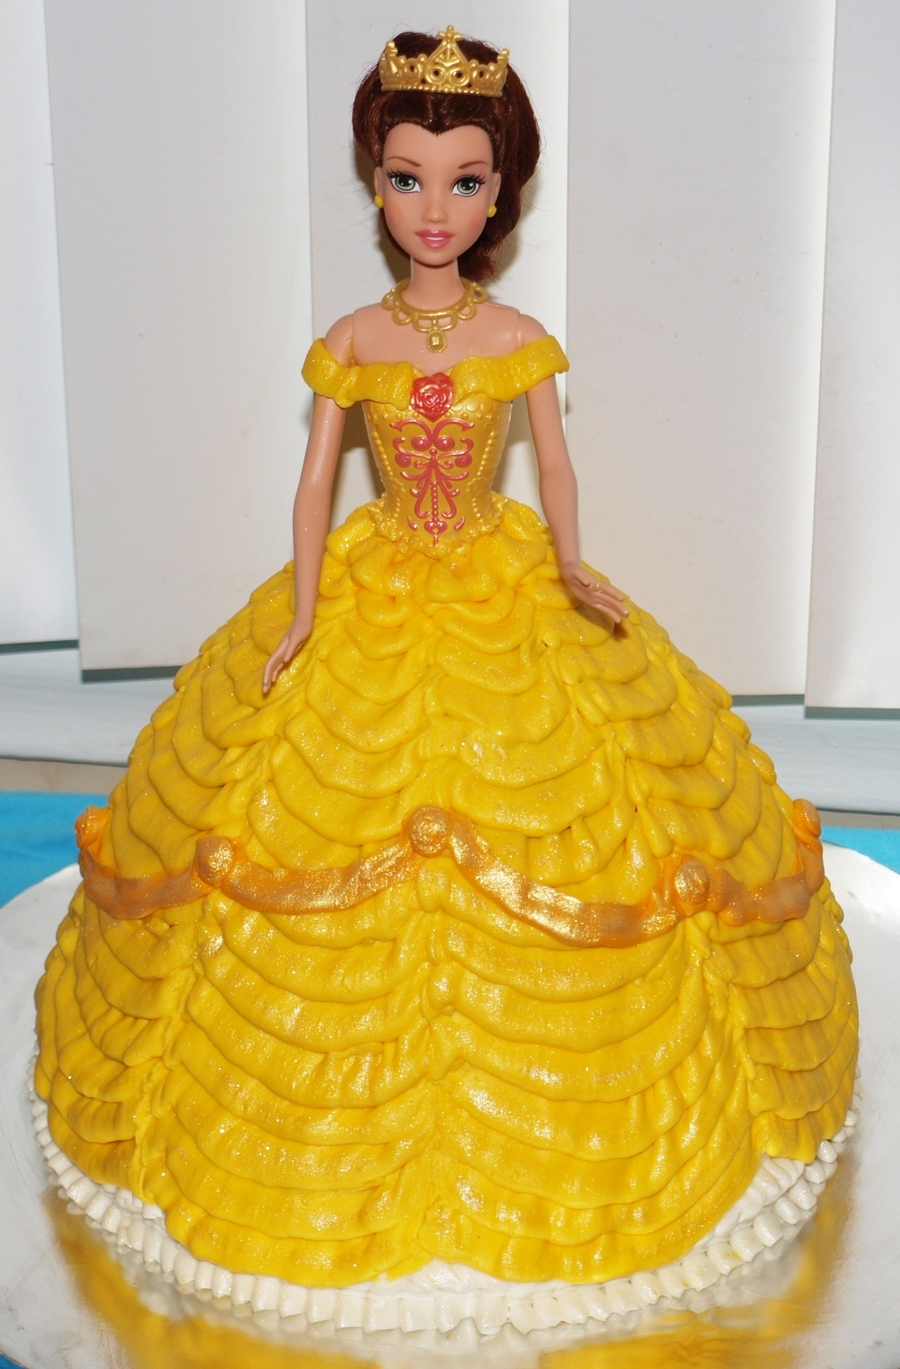 Belle Birthday Cake Ideas